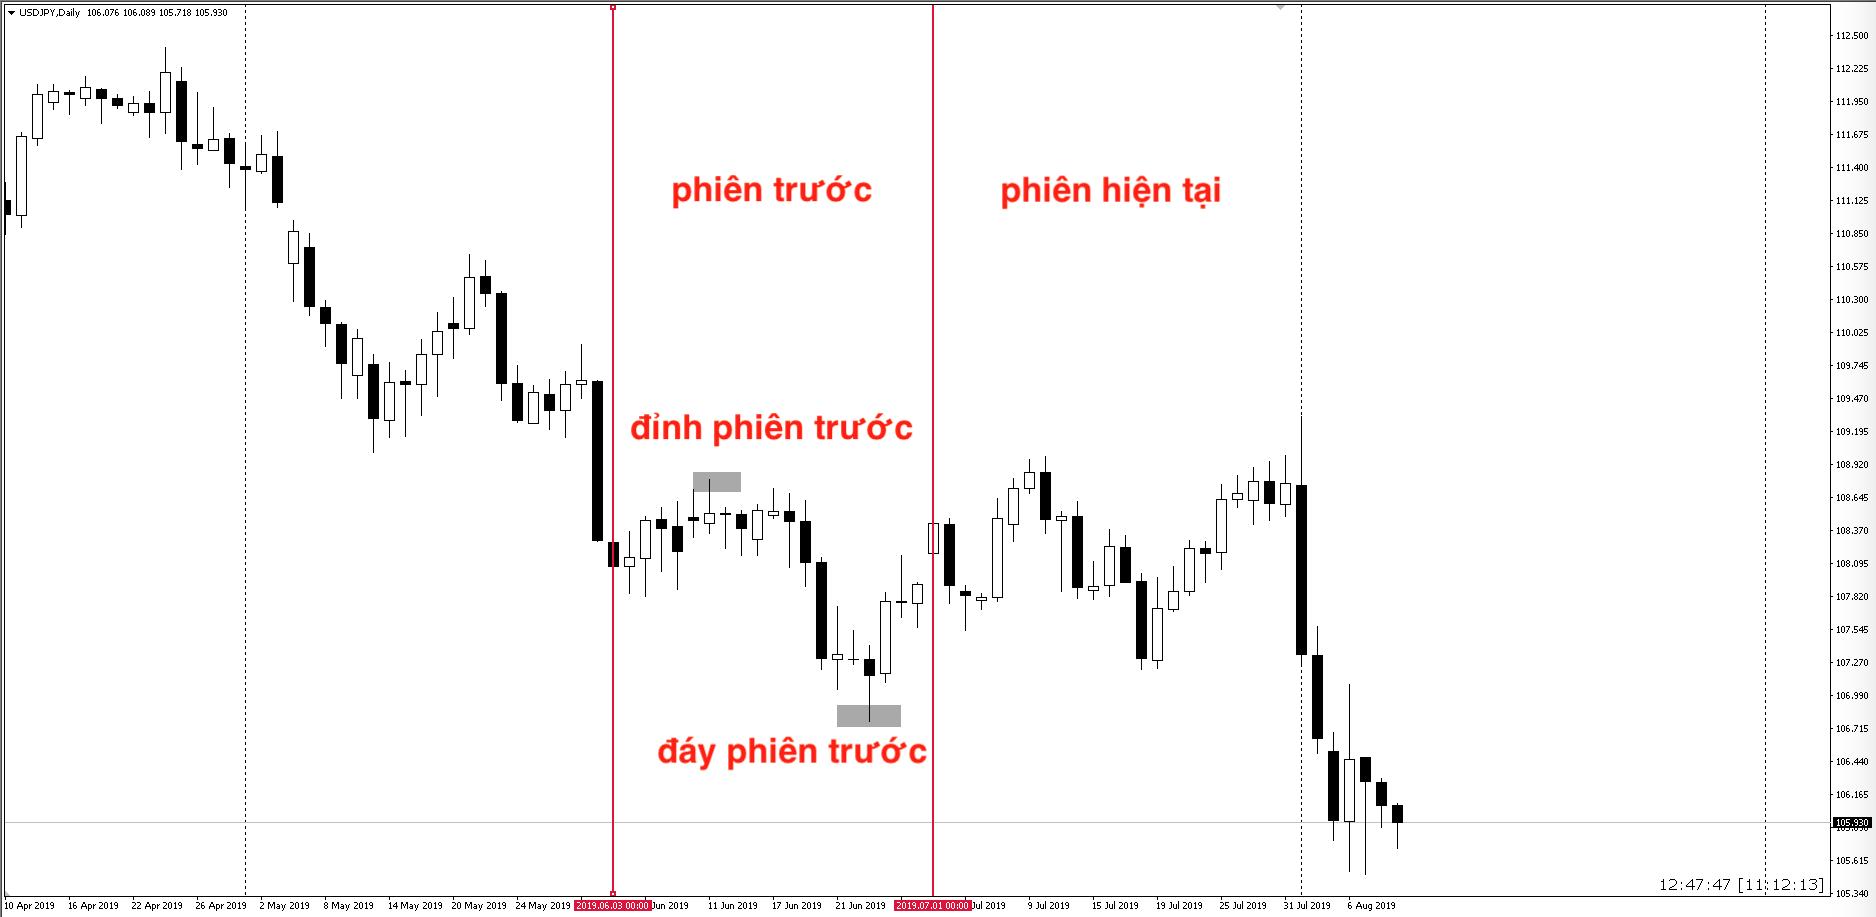 lance-beggs-price-action-traderviet1.